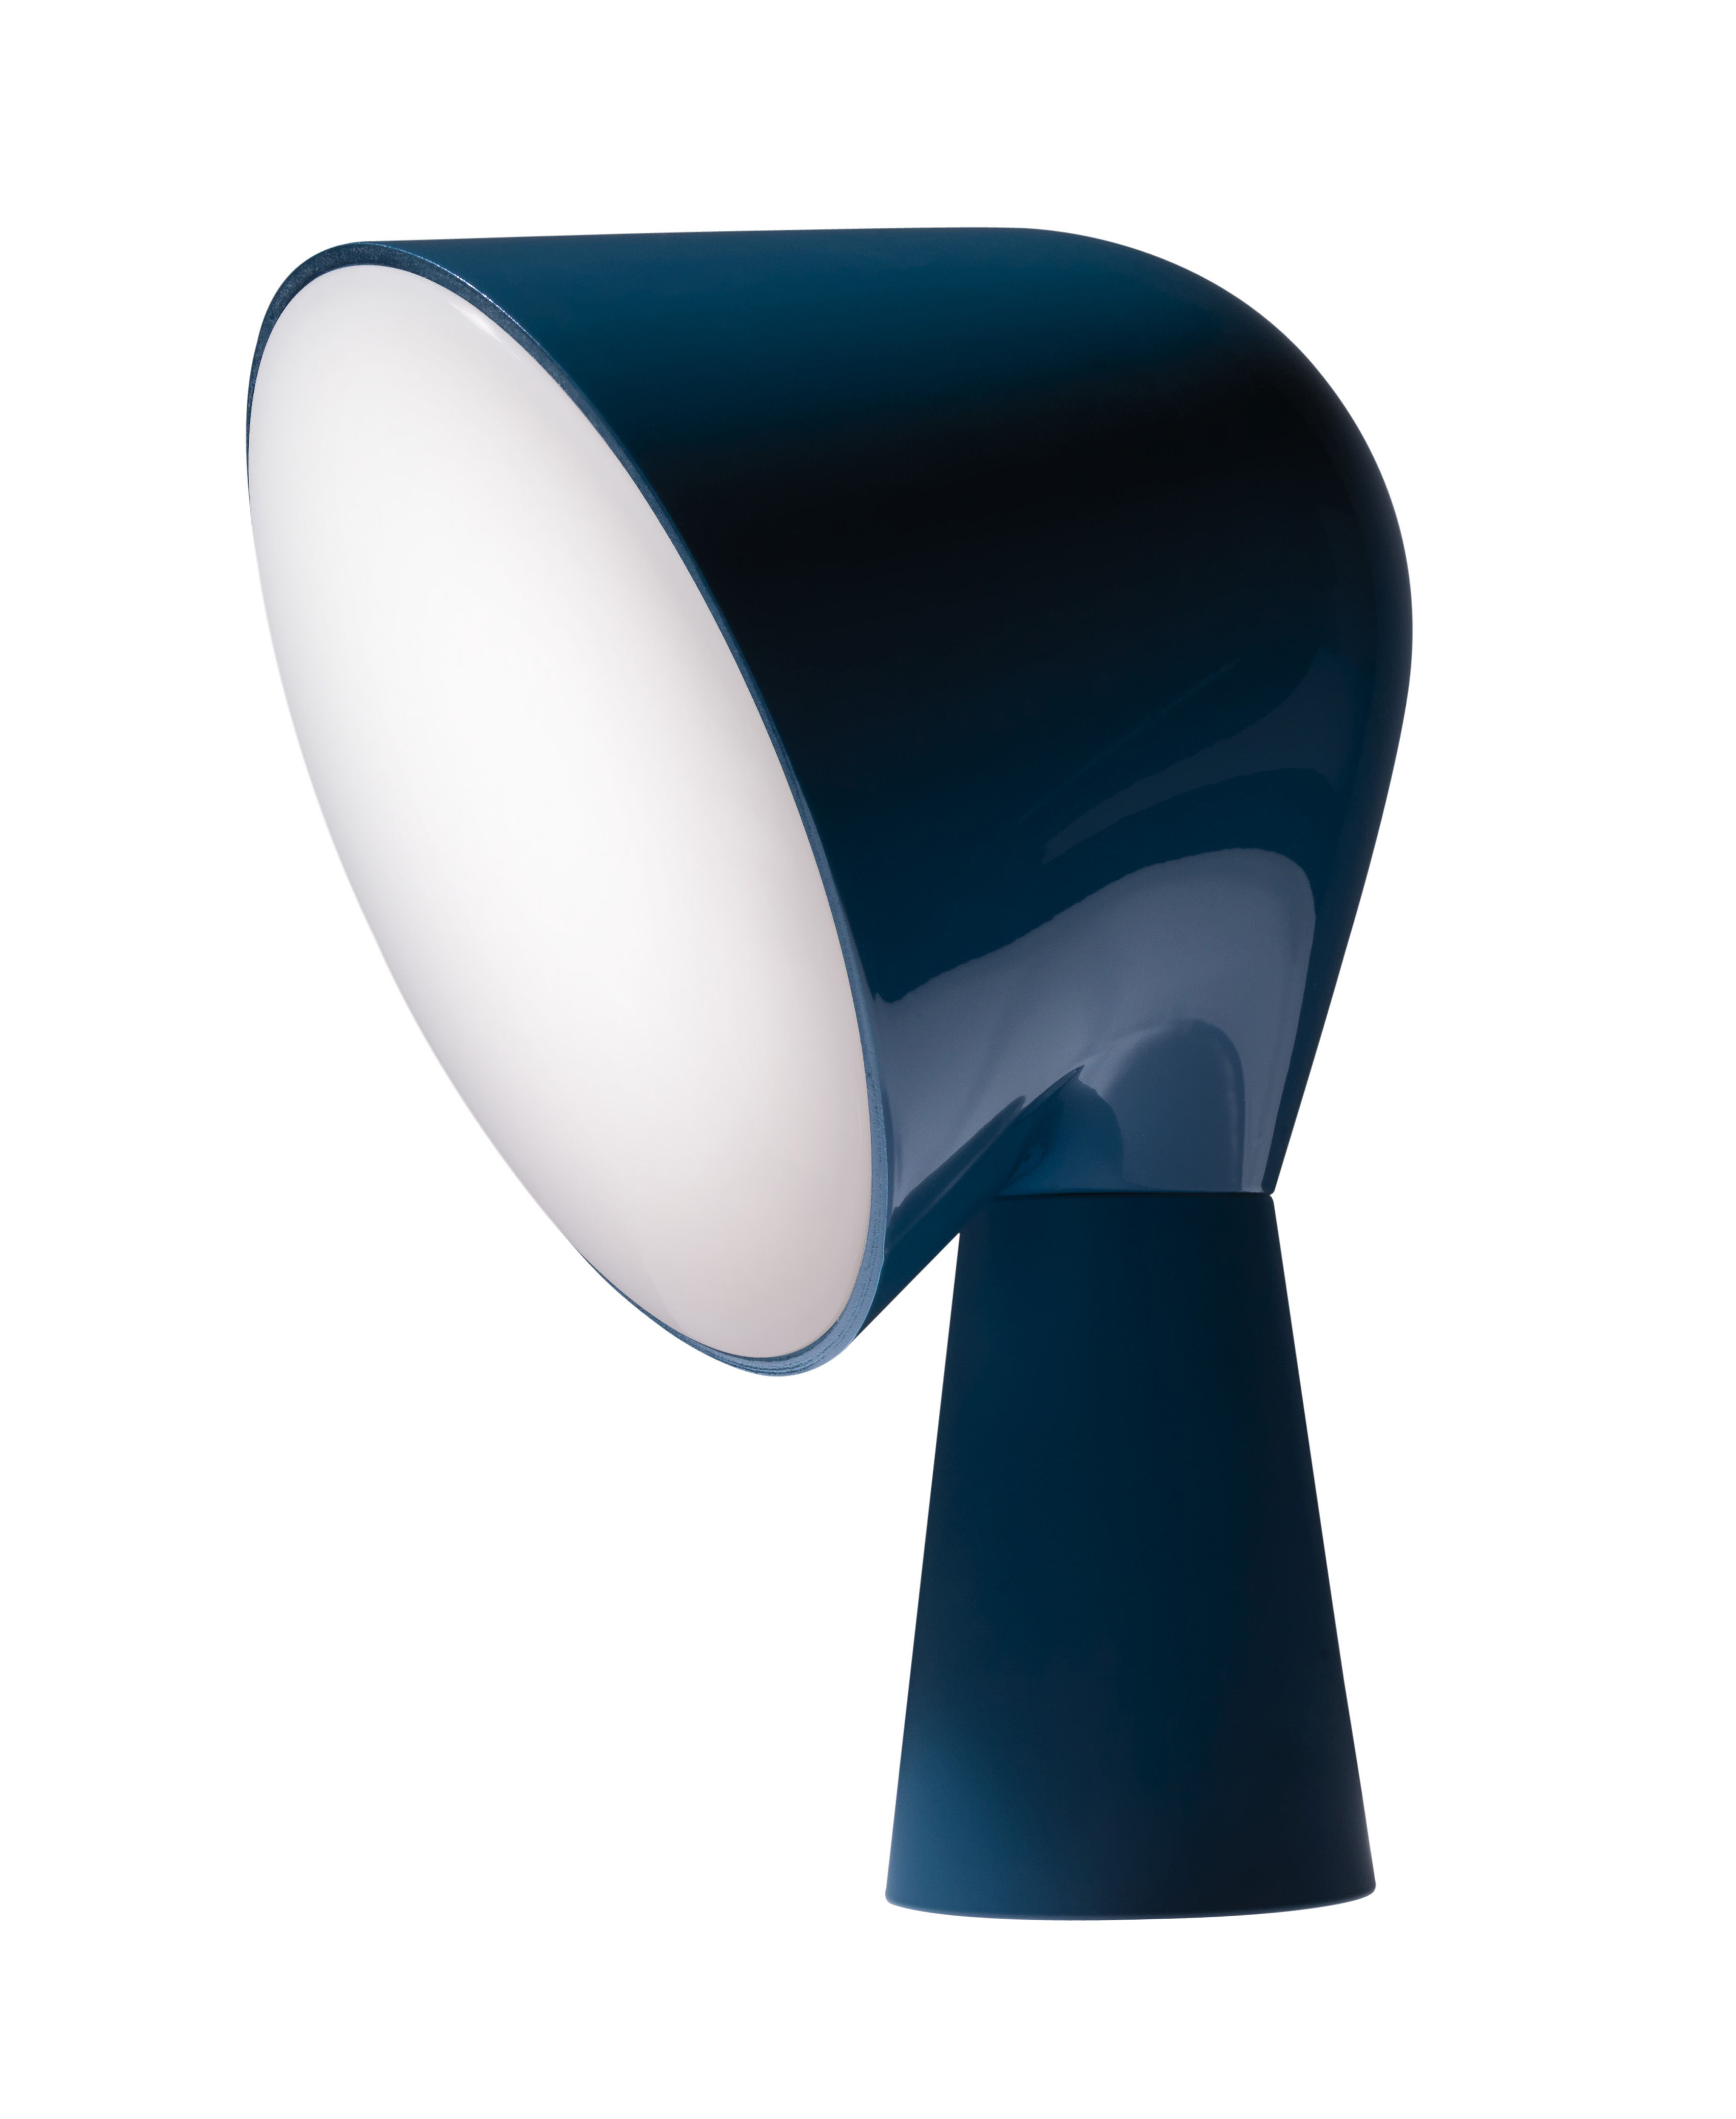 Luminaire - Lampes de table - Lampe de table Binic - Foscarini - Bleu pétrole - ABS, Polycarbonate